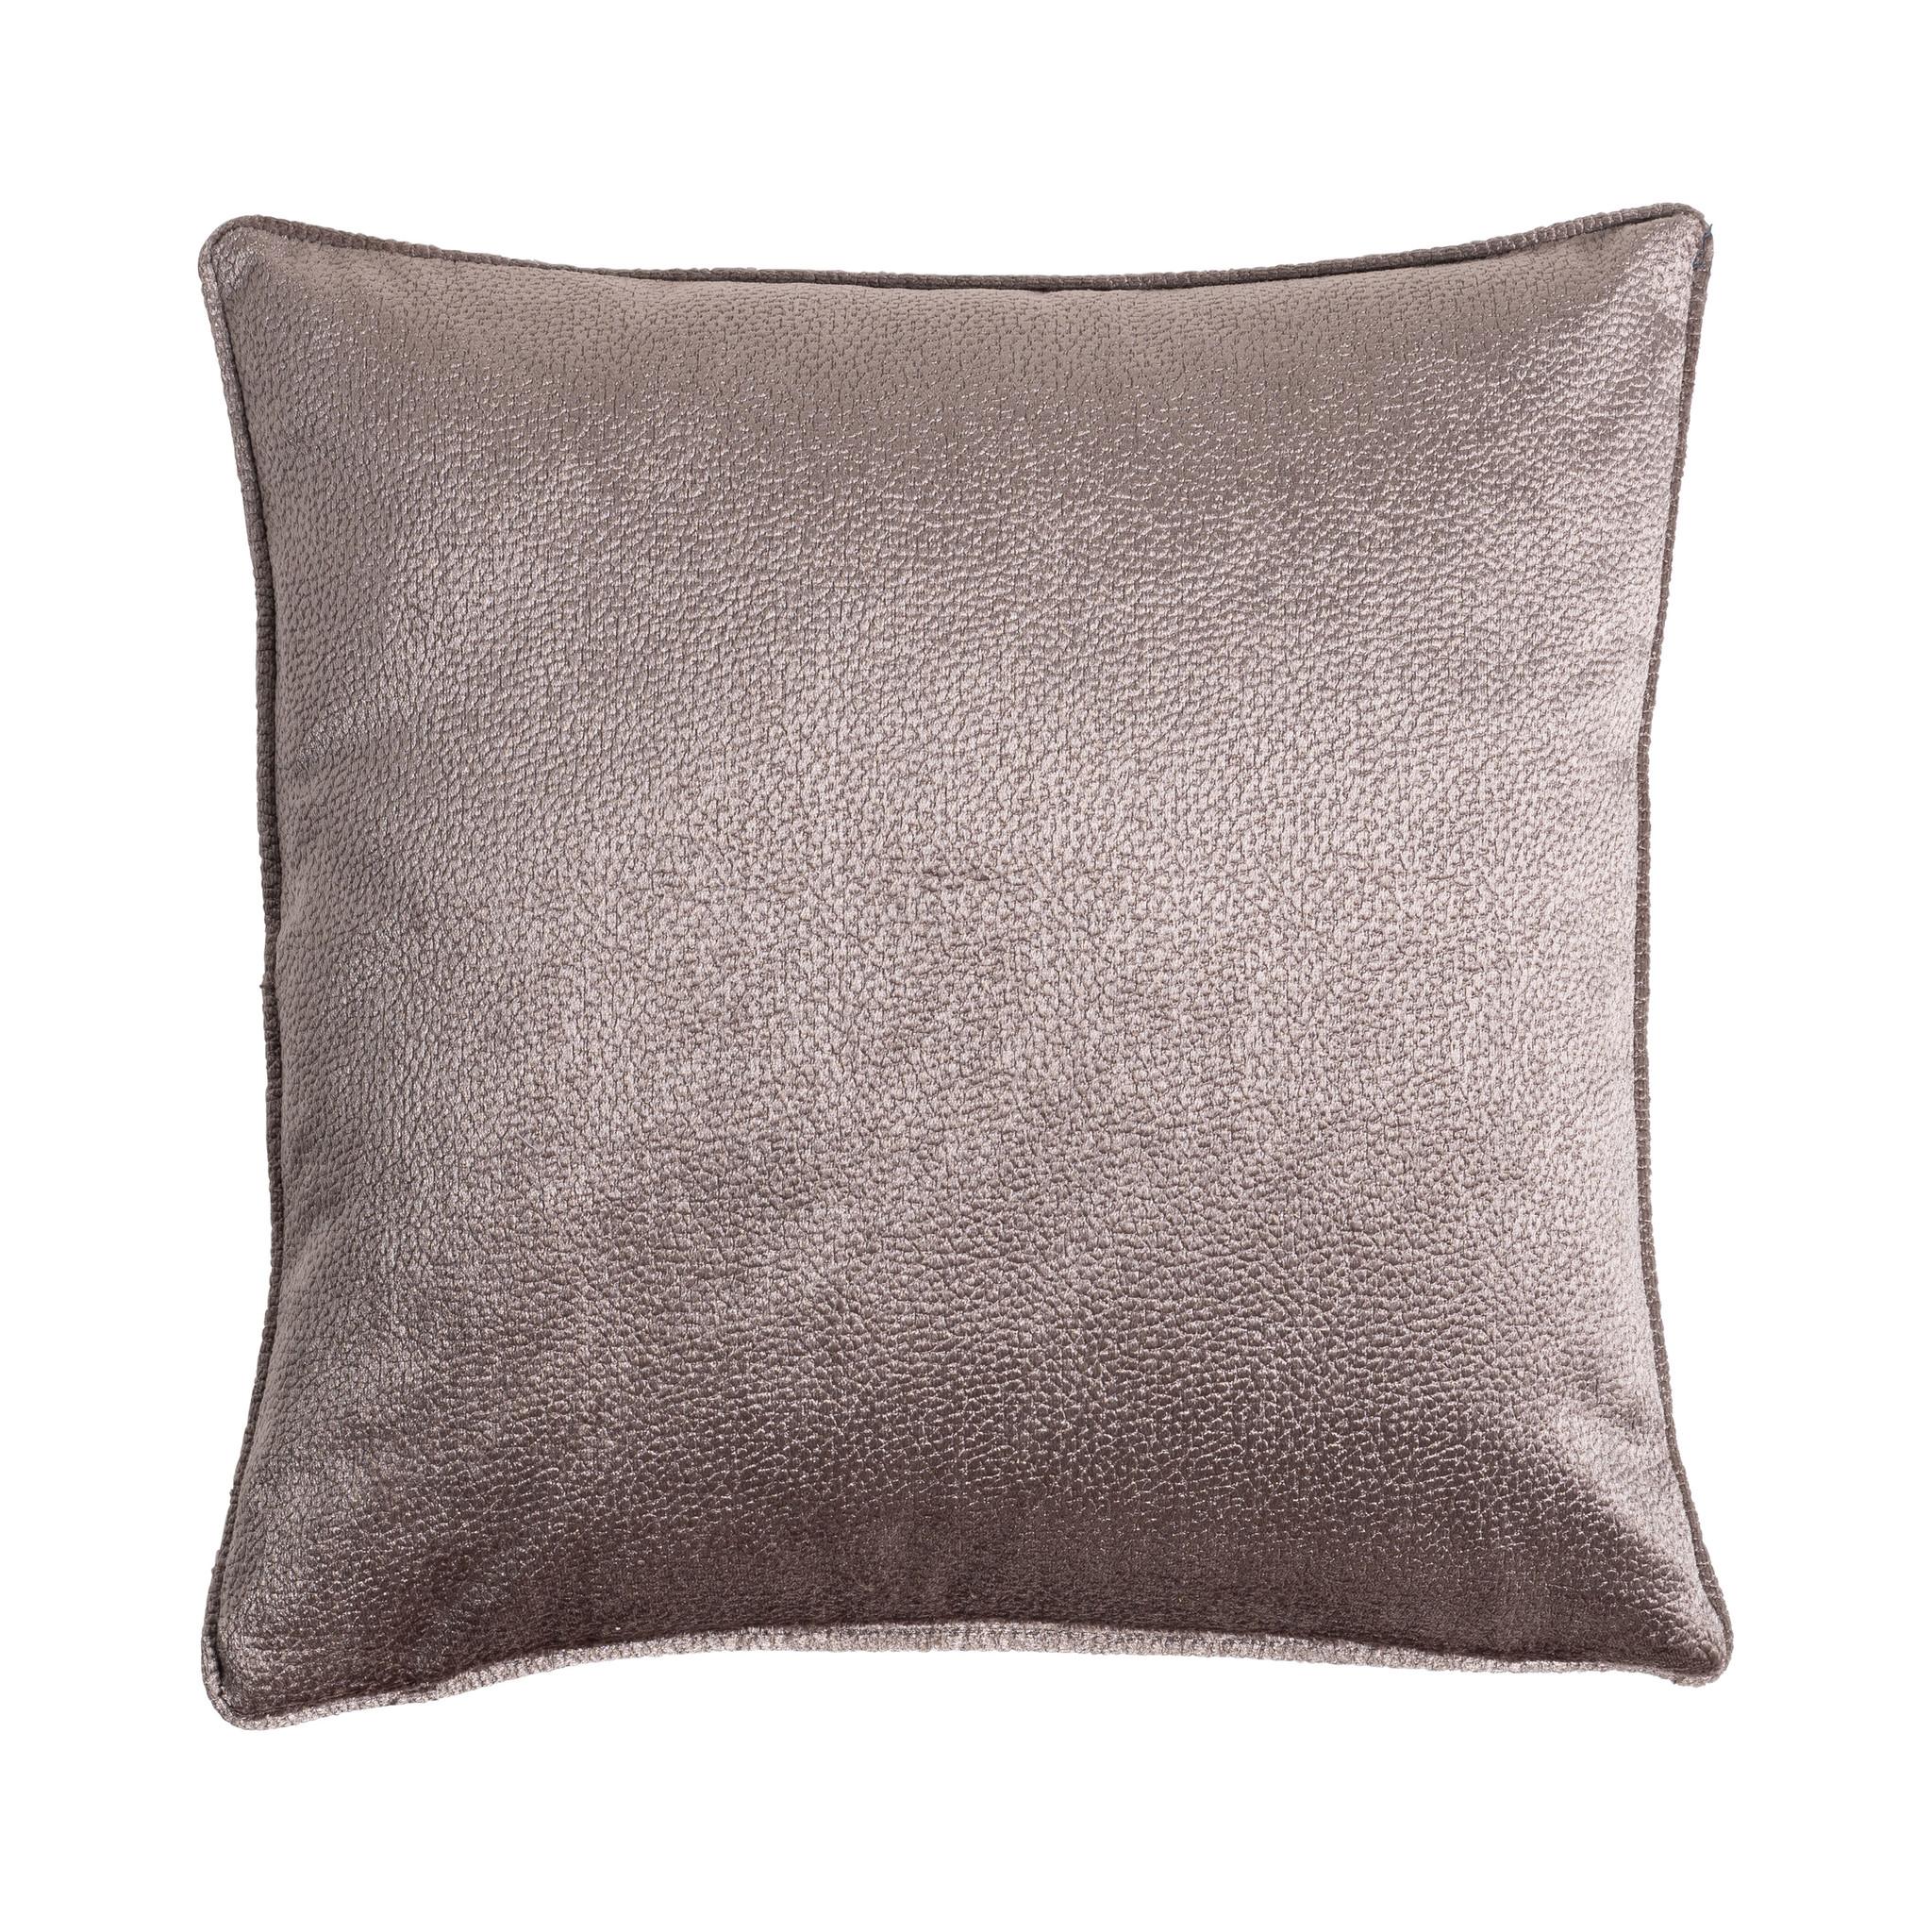 Presence Sierkussenhoes Embossed - Warm grijs Kleur: Grijs